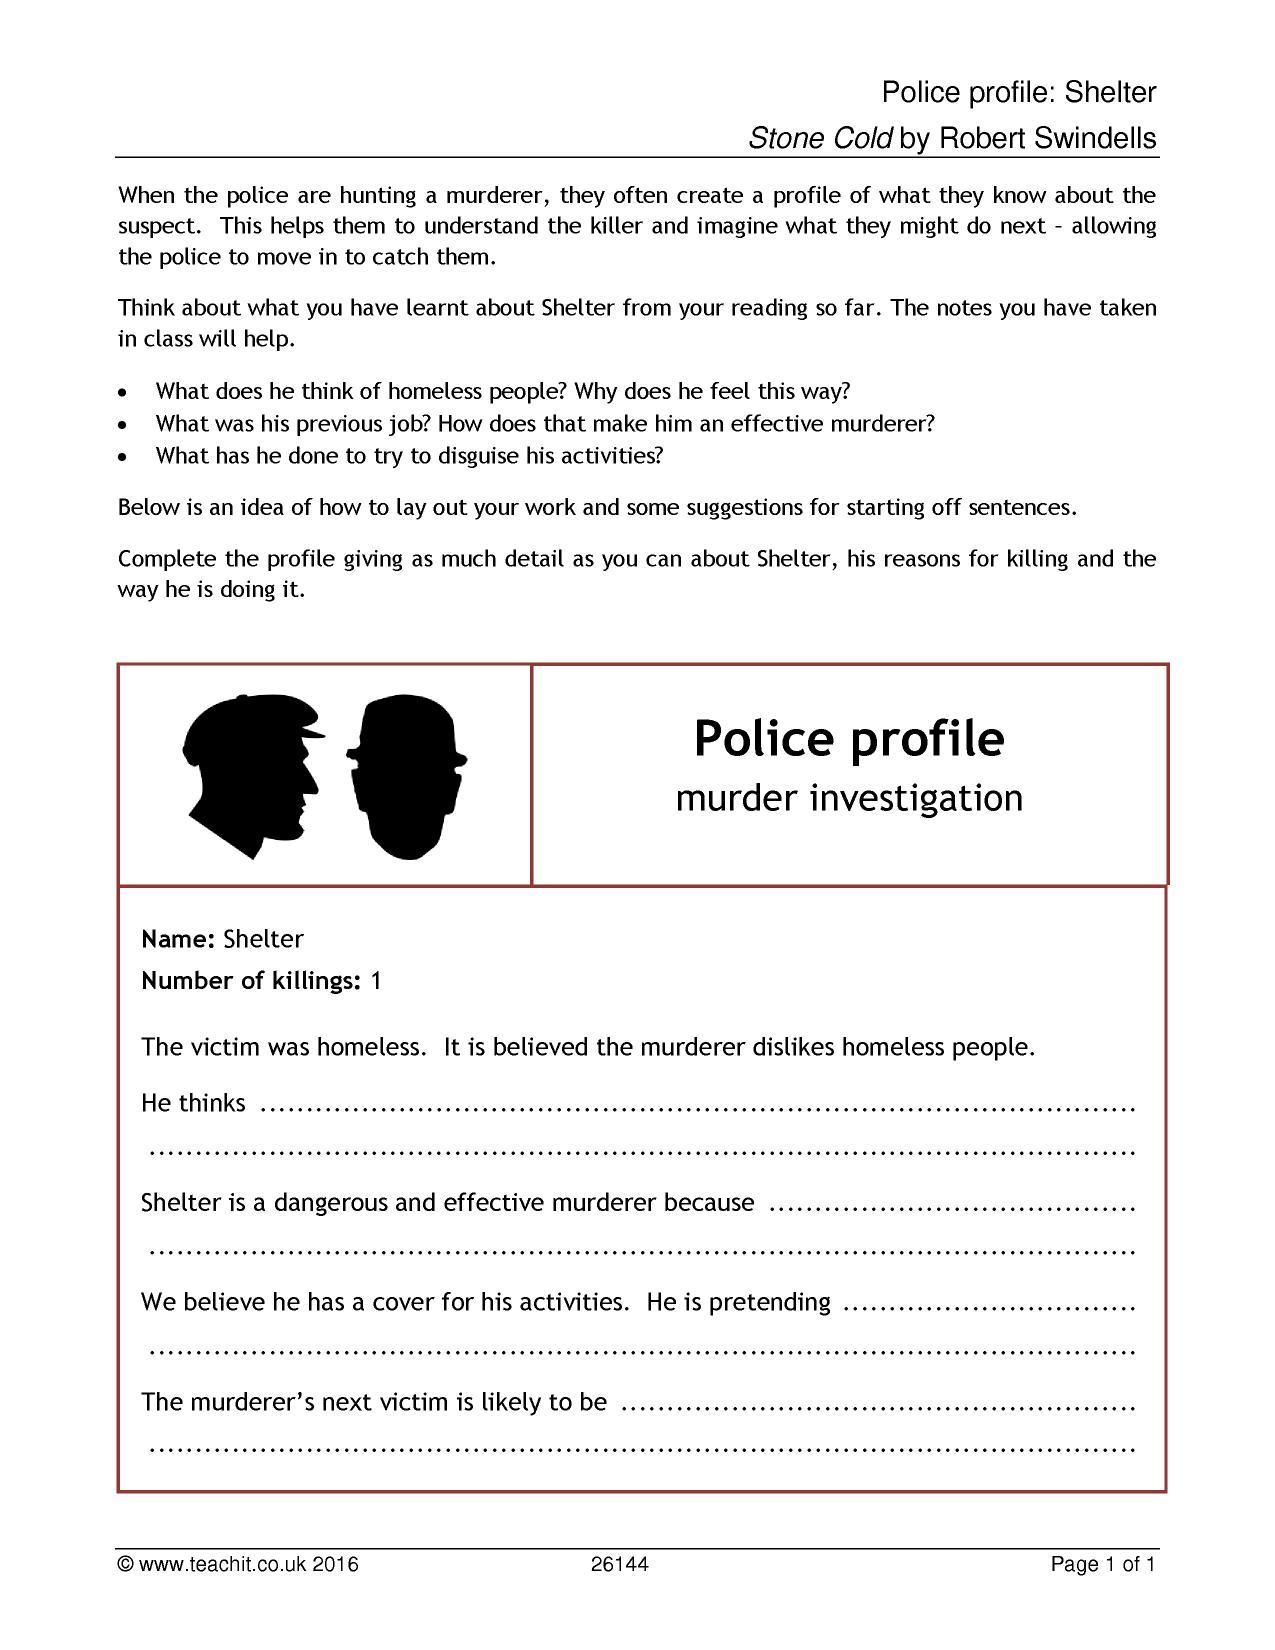 Police Profile Shelter